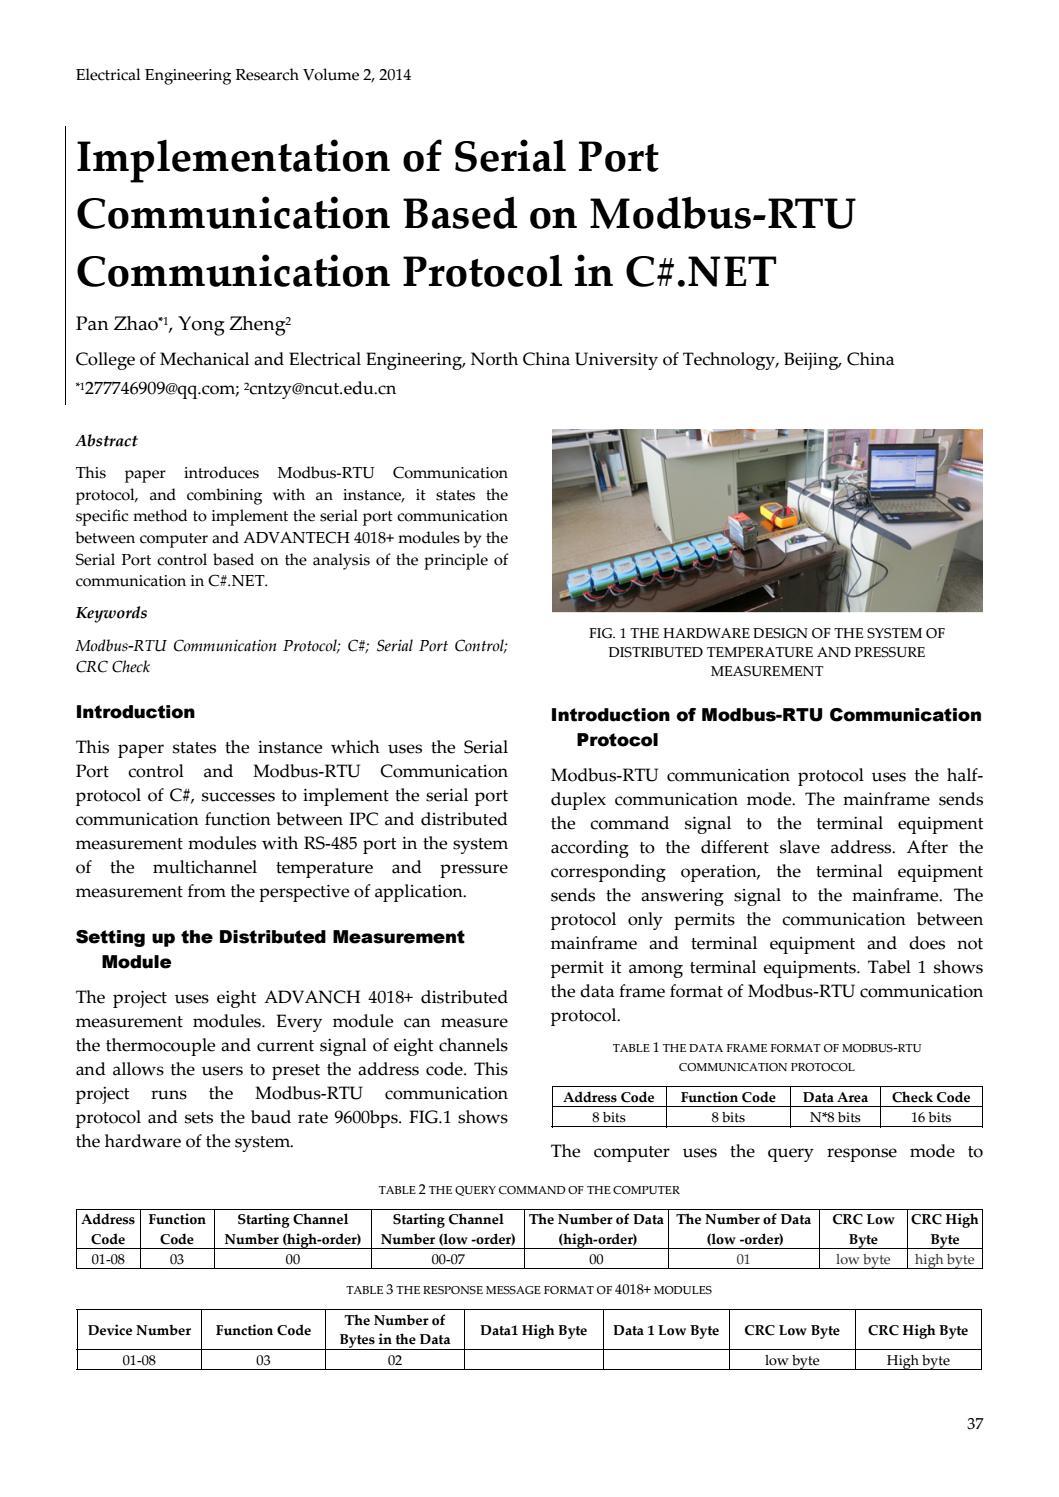 Implementation of Serial Port Communication Based on Modbus